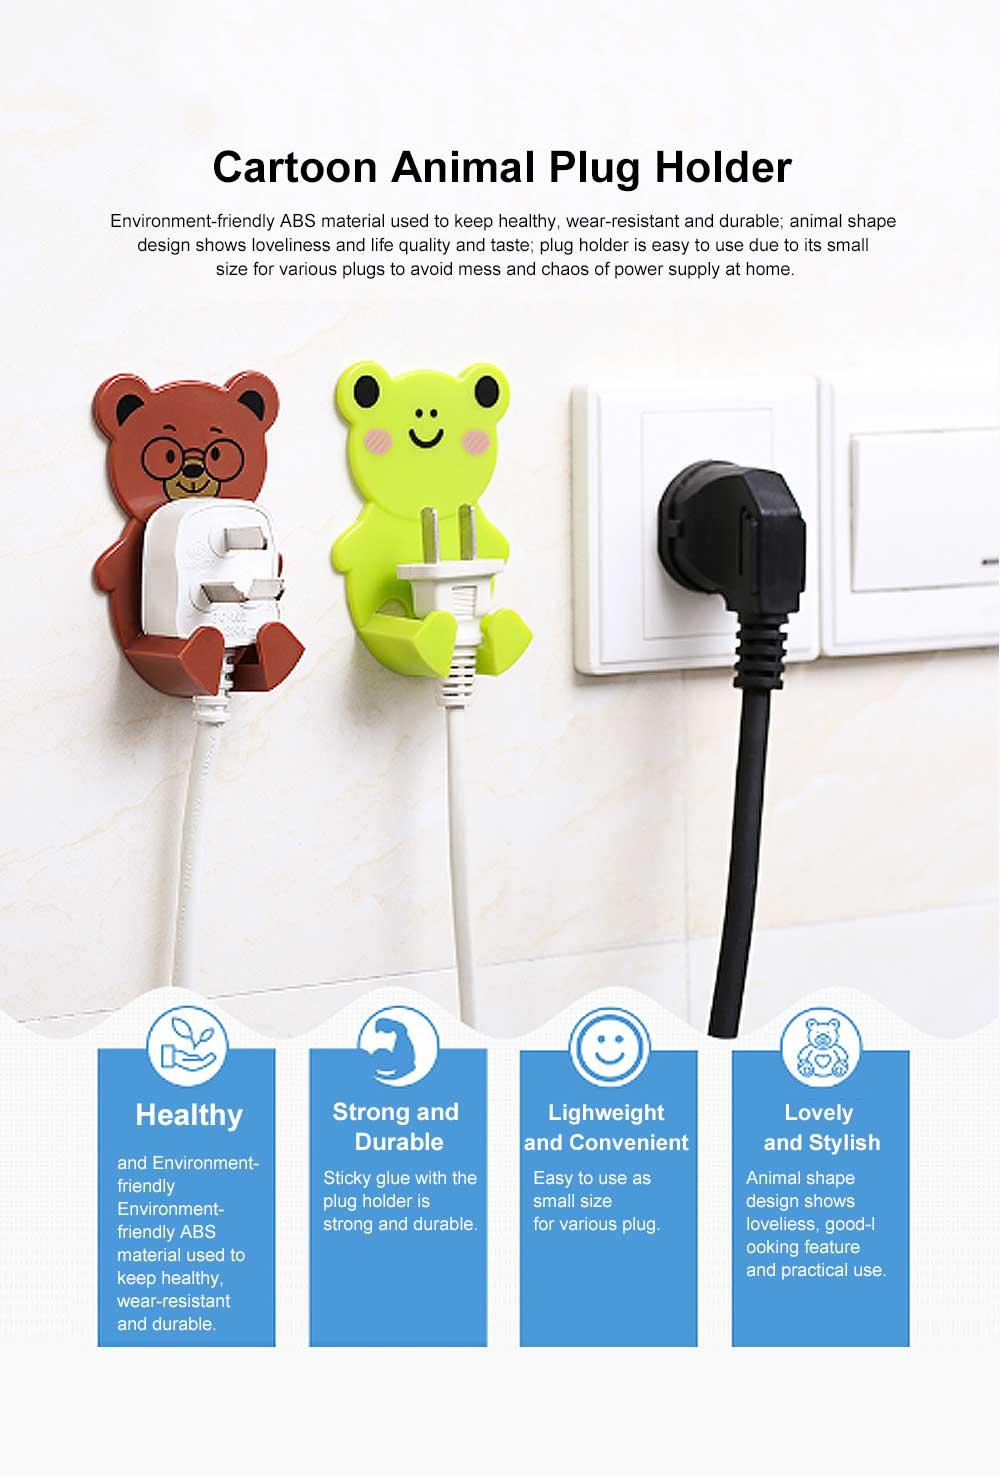 Cartoon Animal Plug Holder for Kitchen Power Supply Sticky Hook for Plug Lovely Animal Shape Wall-mounted Sticky Plug Holder Household Plug Storage Helper 0